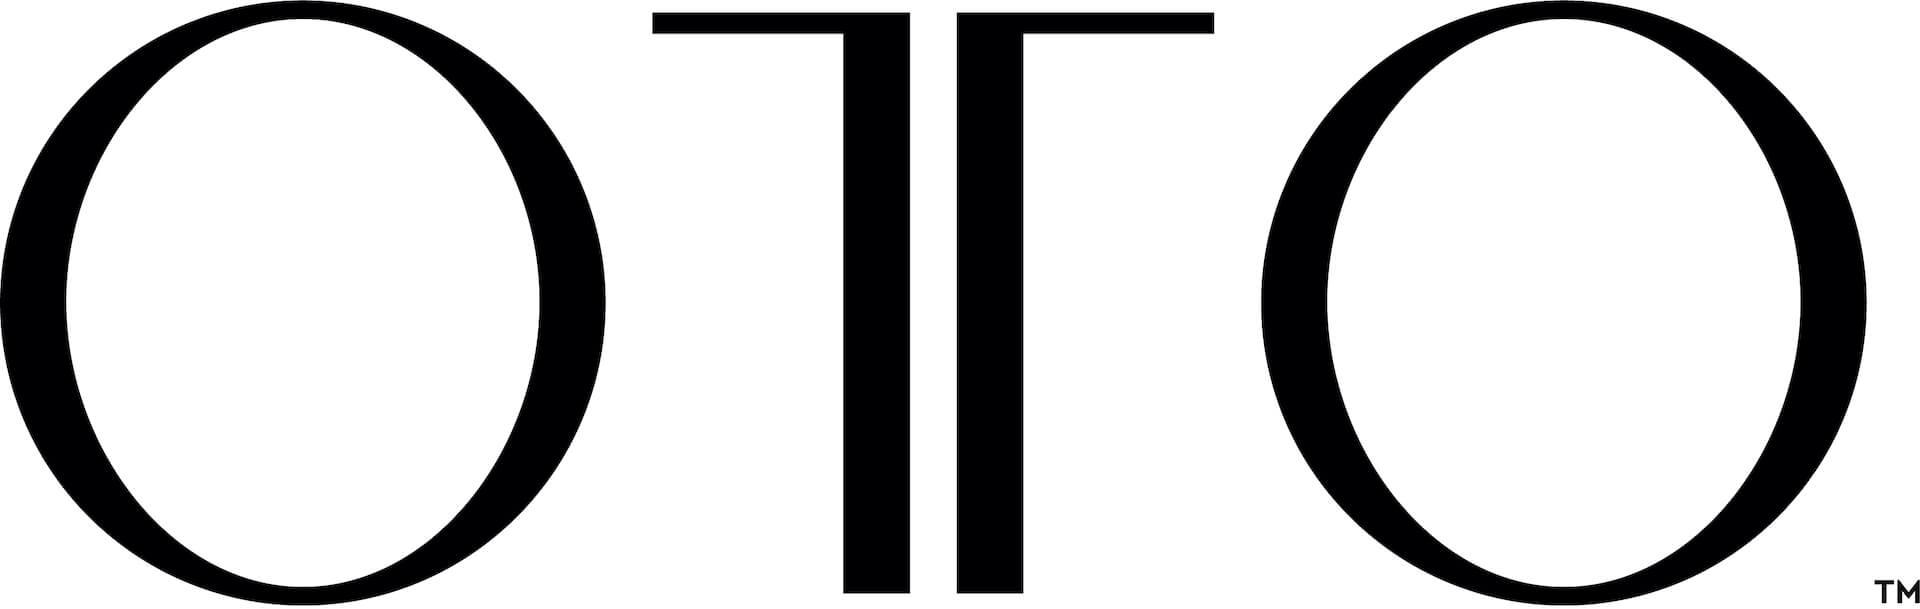 CBDブランド「OTO」が TRUNK(HOTEL)にてローンチイベントを開催!期間限定ドリンクも Fation210608_oto_CBD2